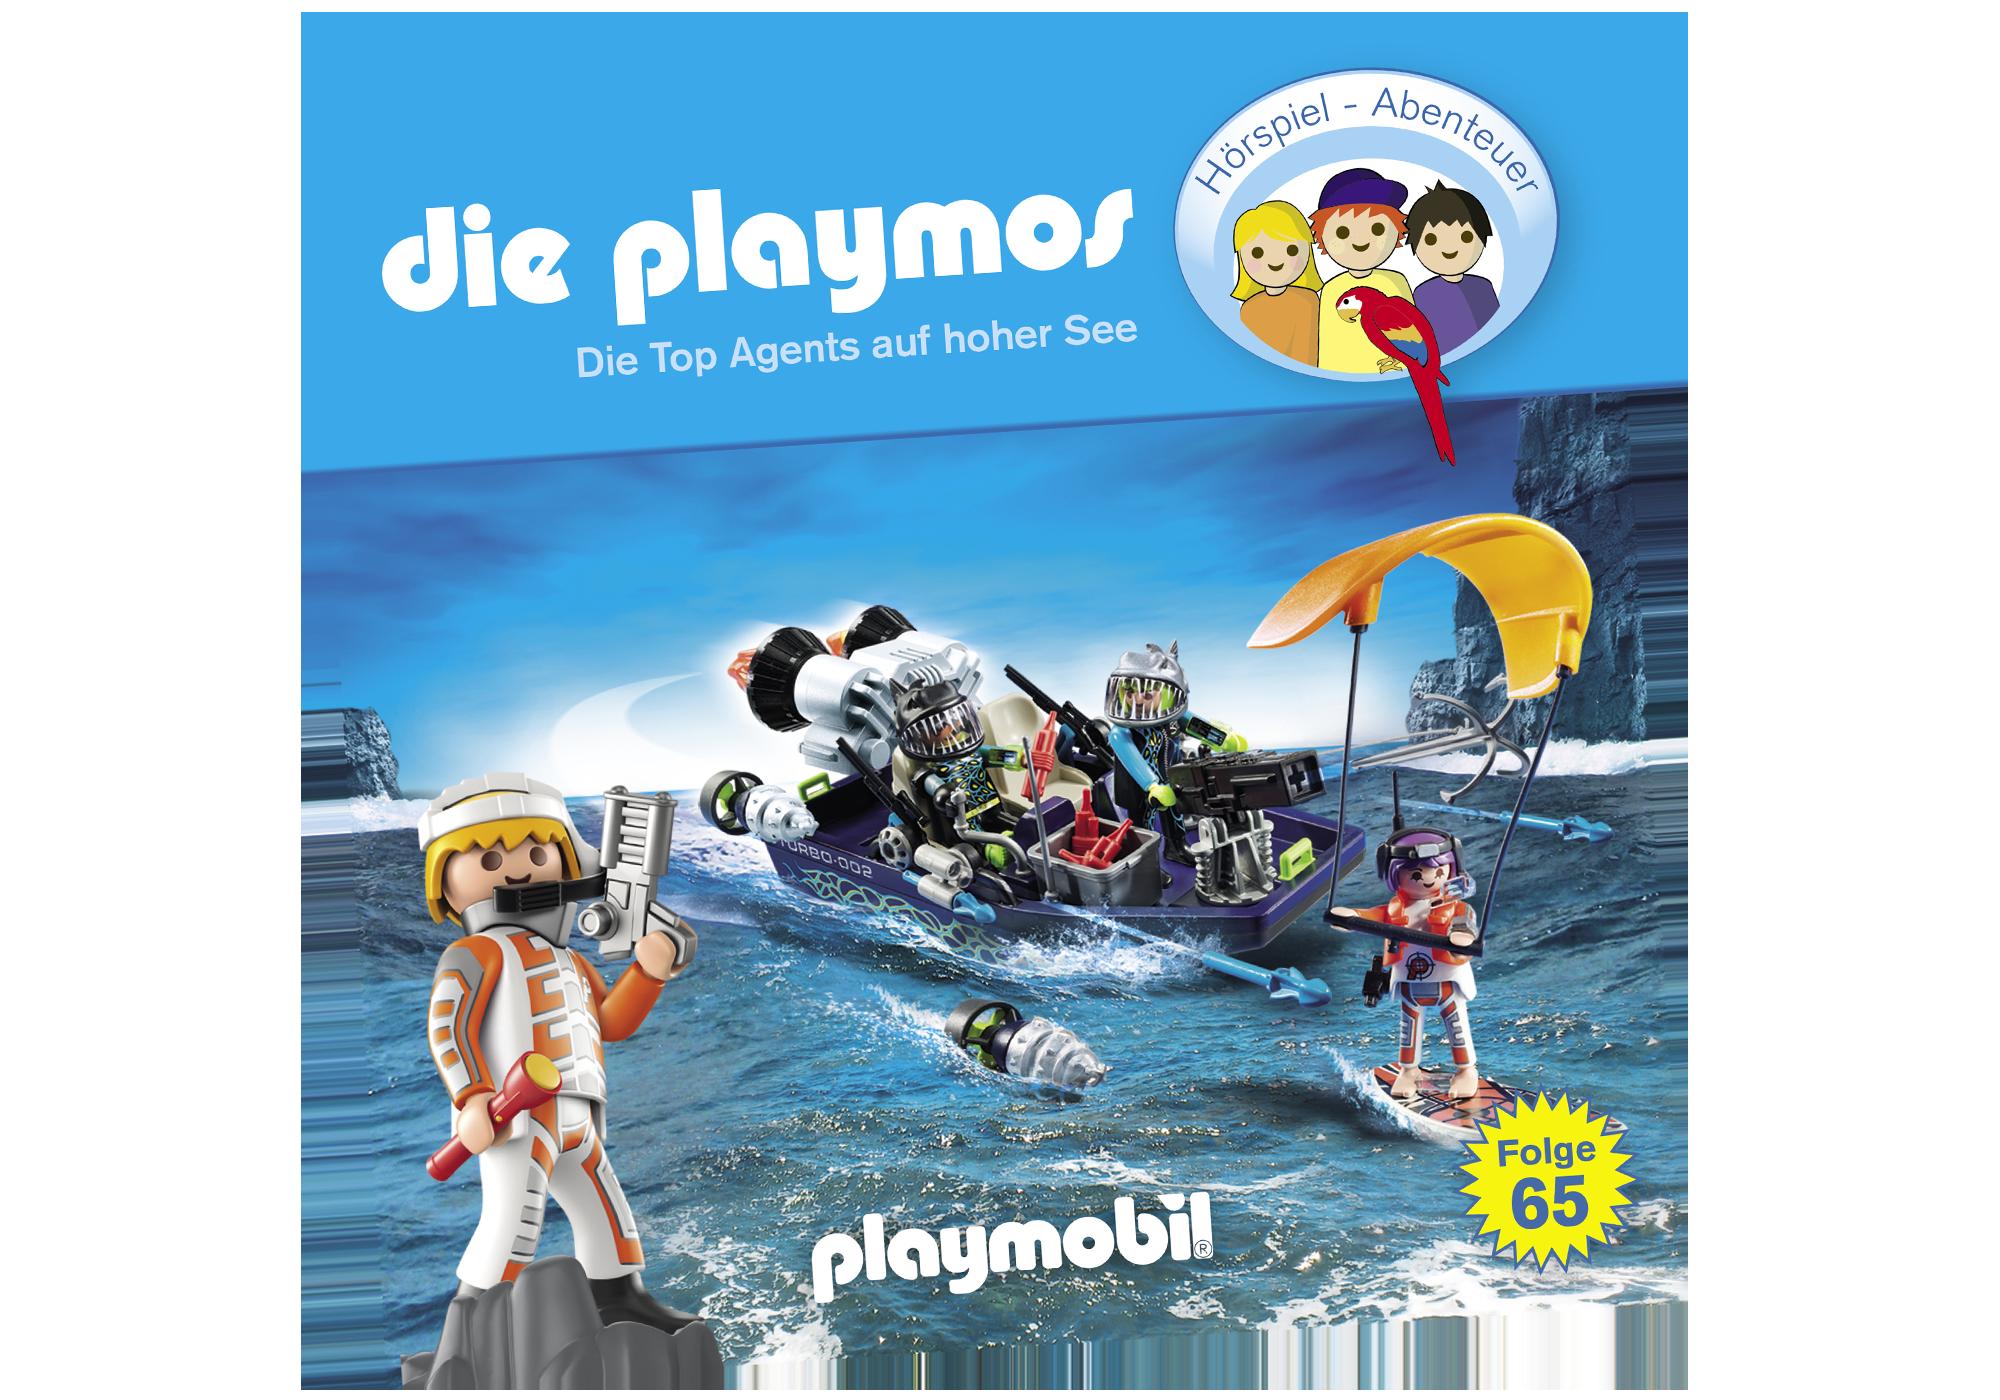 http://media.playmobil.com/i/playmobil/80133_product_detail